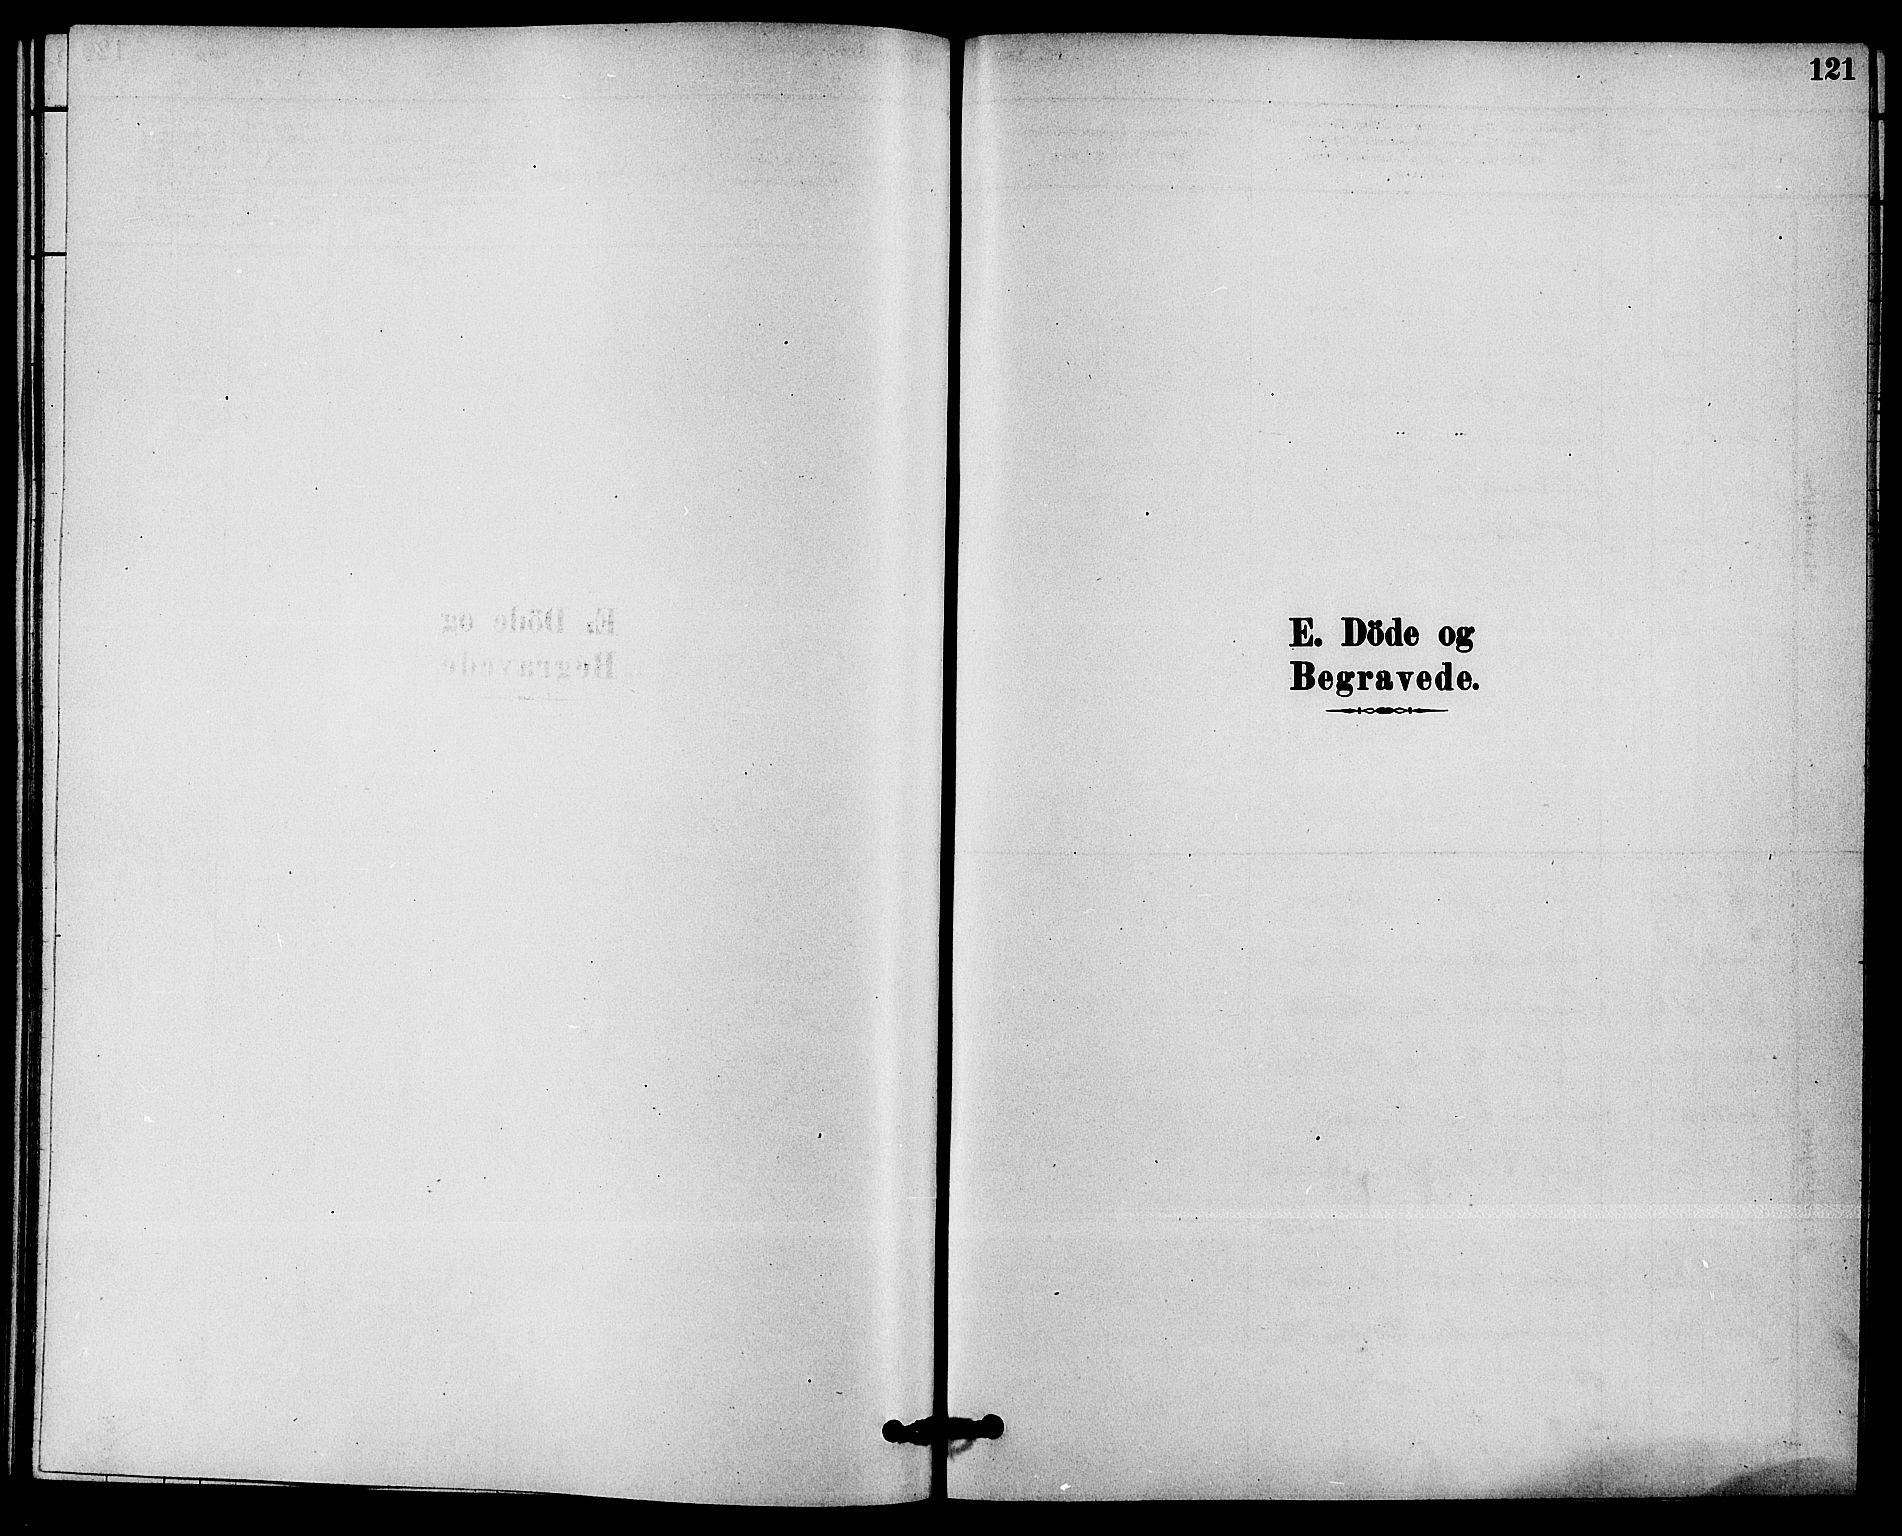 SAKO, Solum kirkebøker, F/Fb/L0001: Ministerialbok nr. II 1, 1877-1892, s. 121